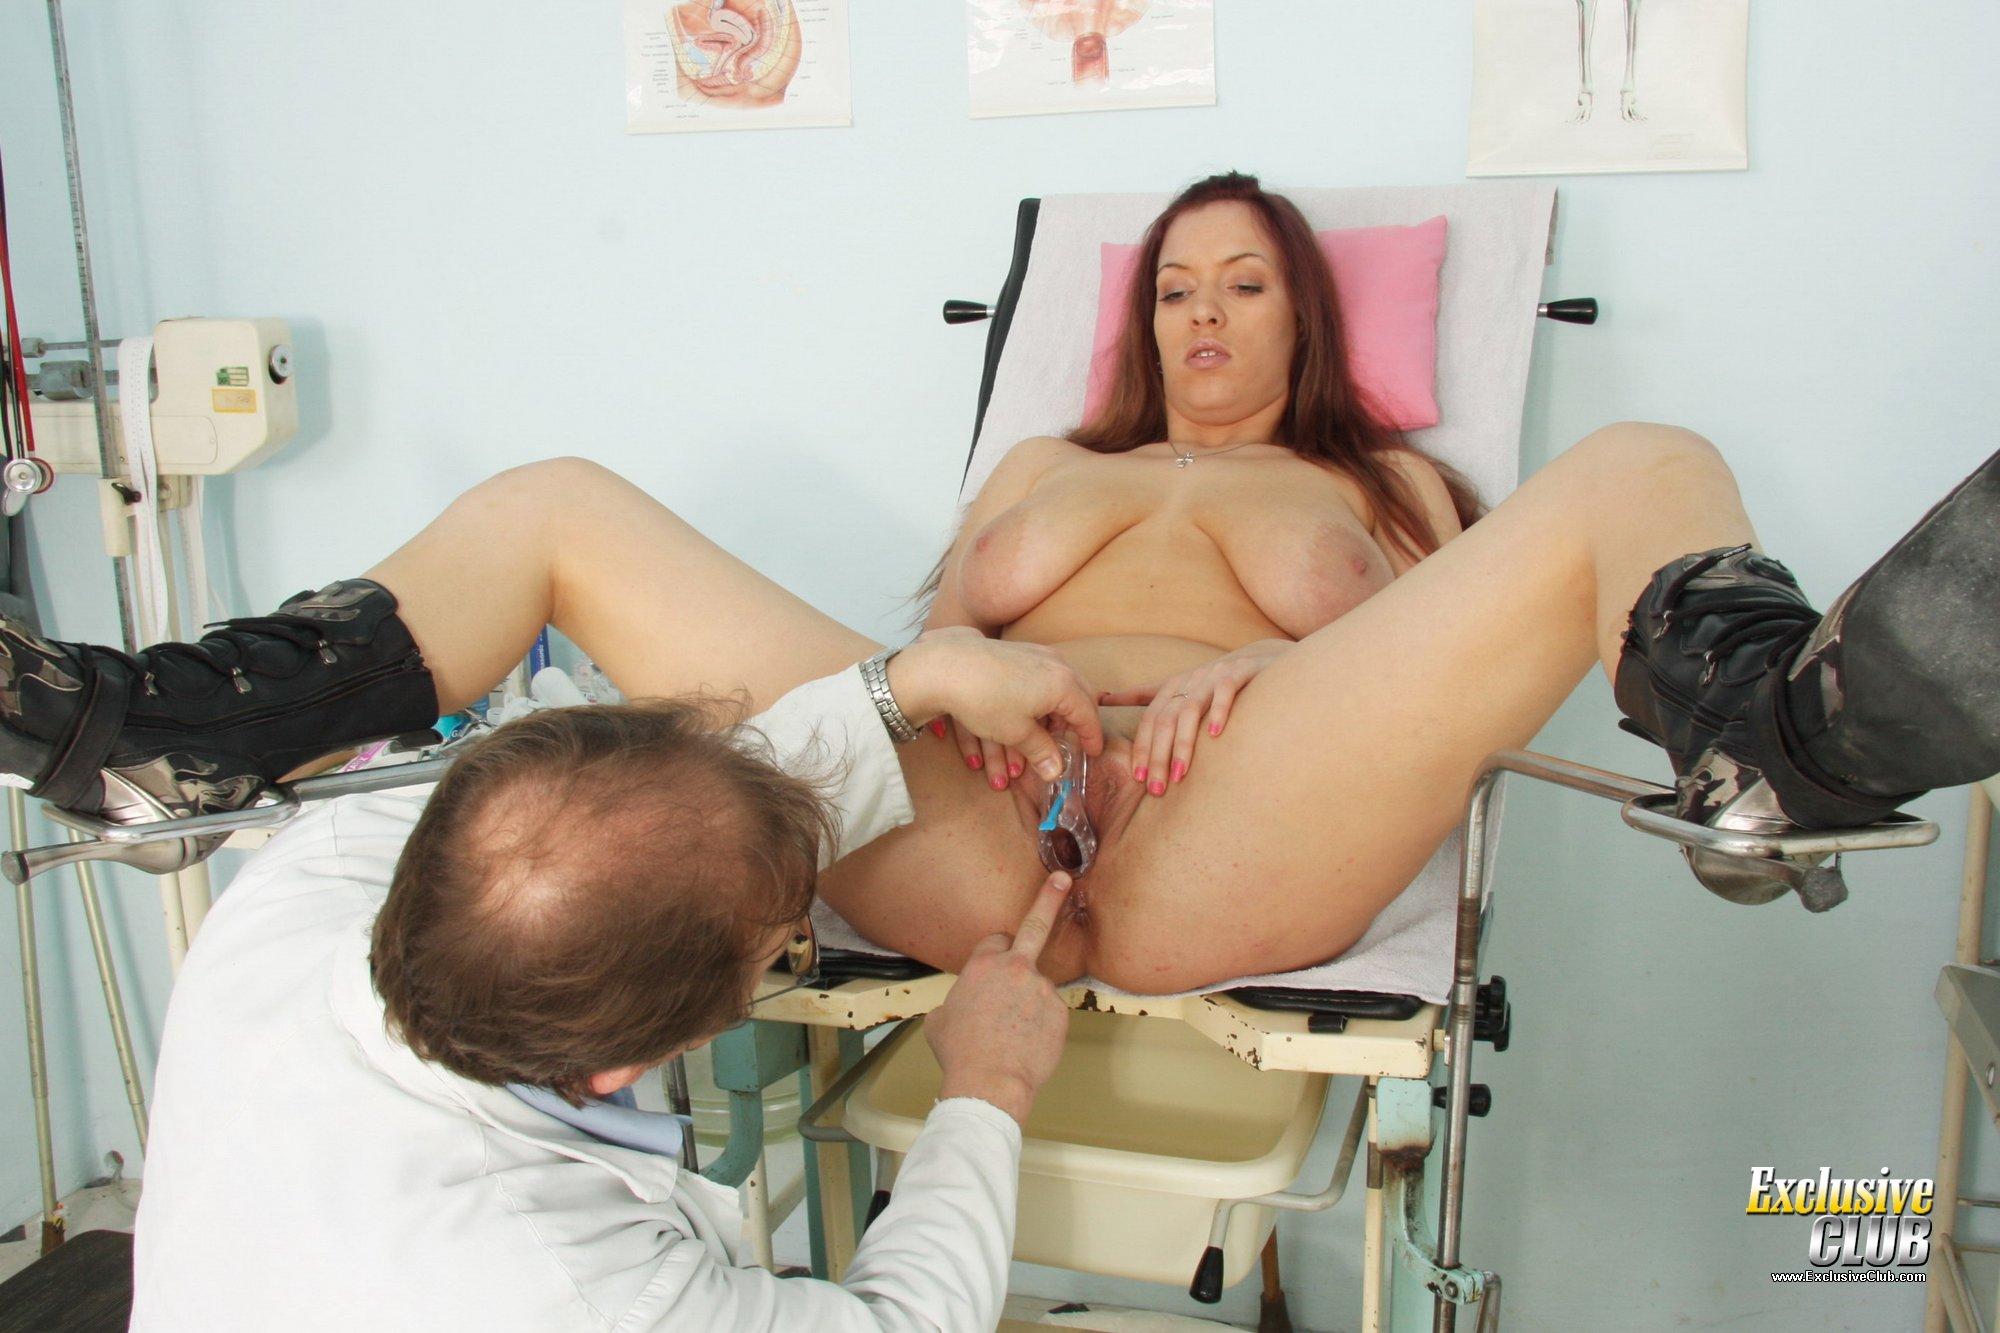 Gyno patient monika pussy speculum gyno clinic examination 9